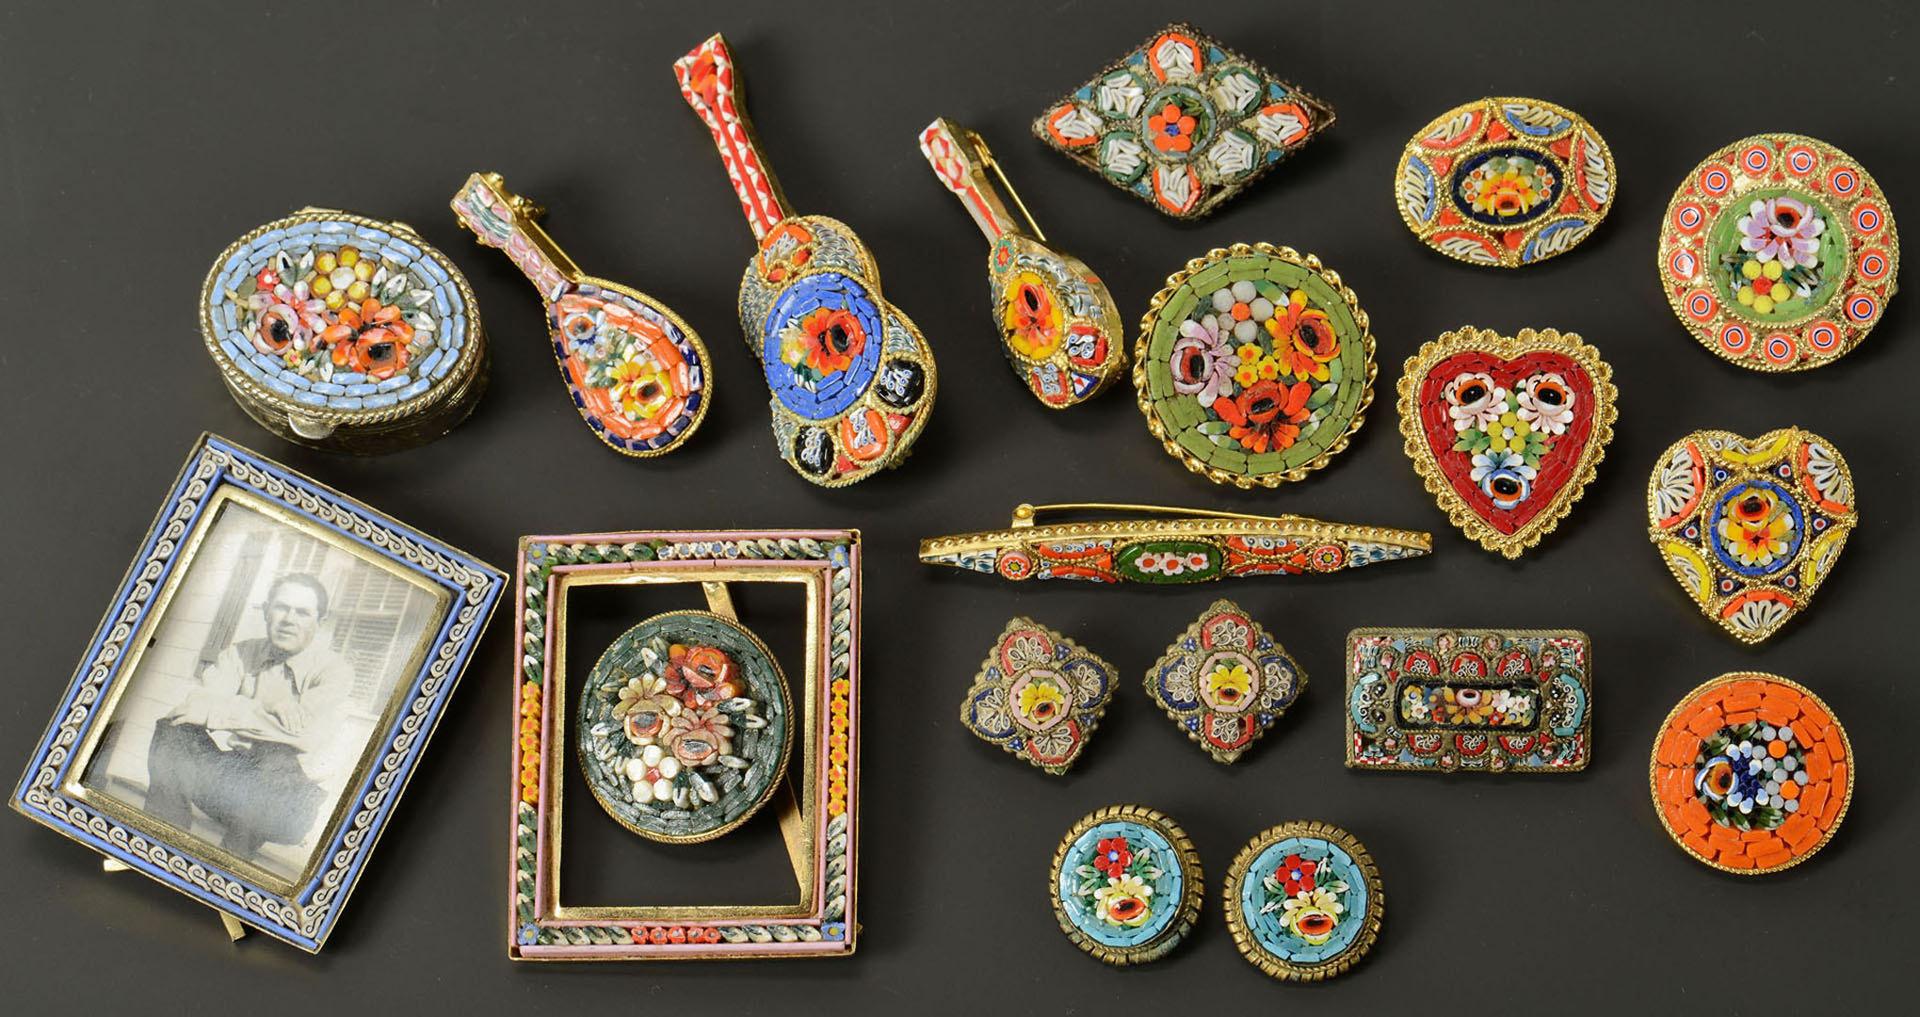 Lot 494: Group of Vintage Italian Micromosaic Jewelry